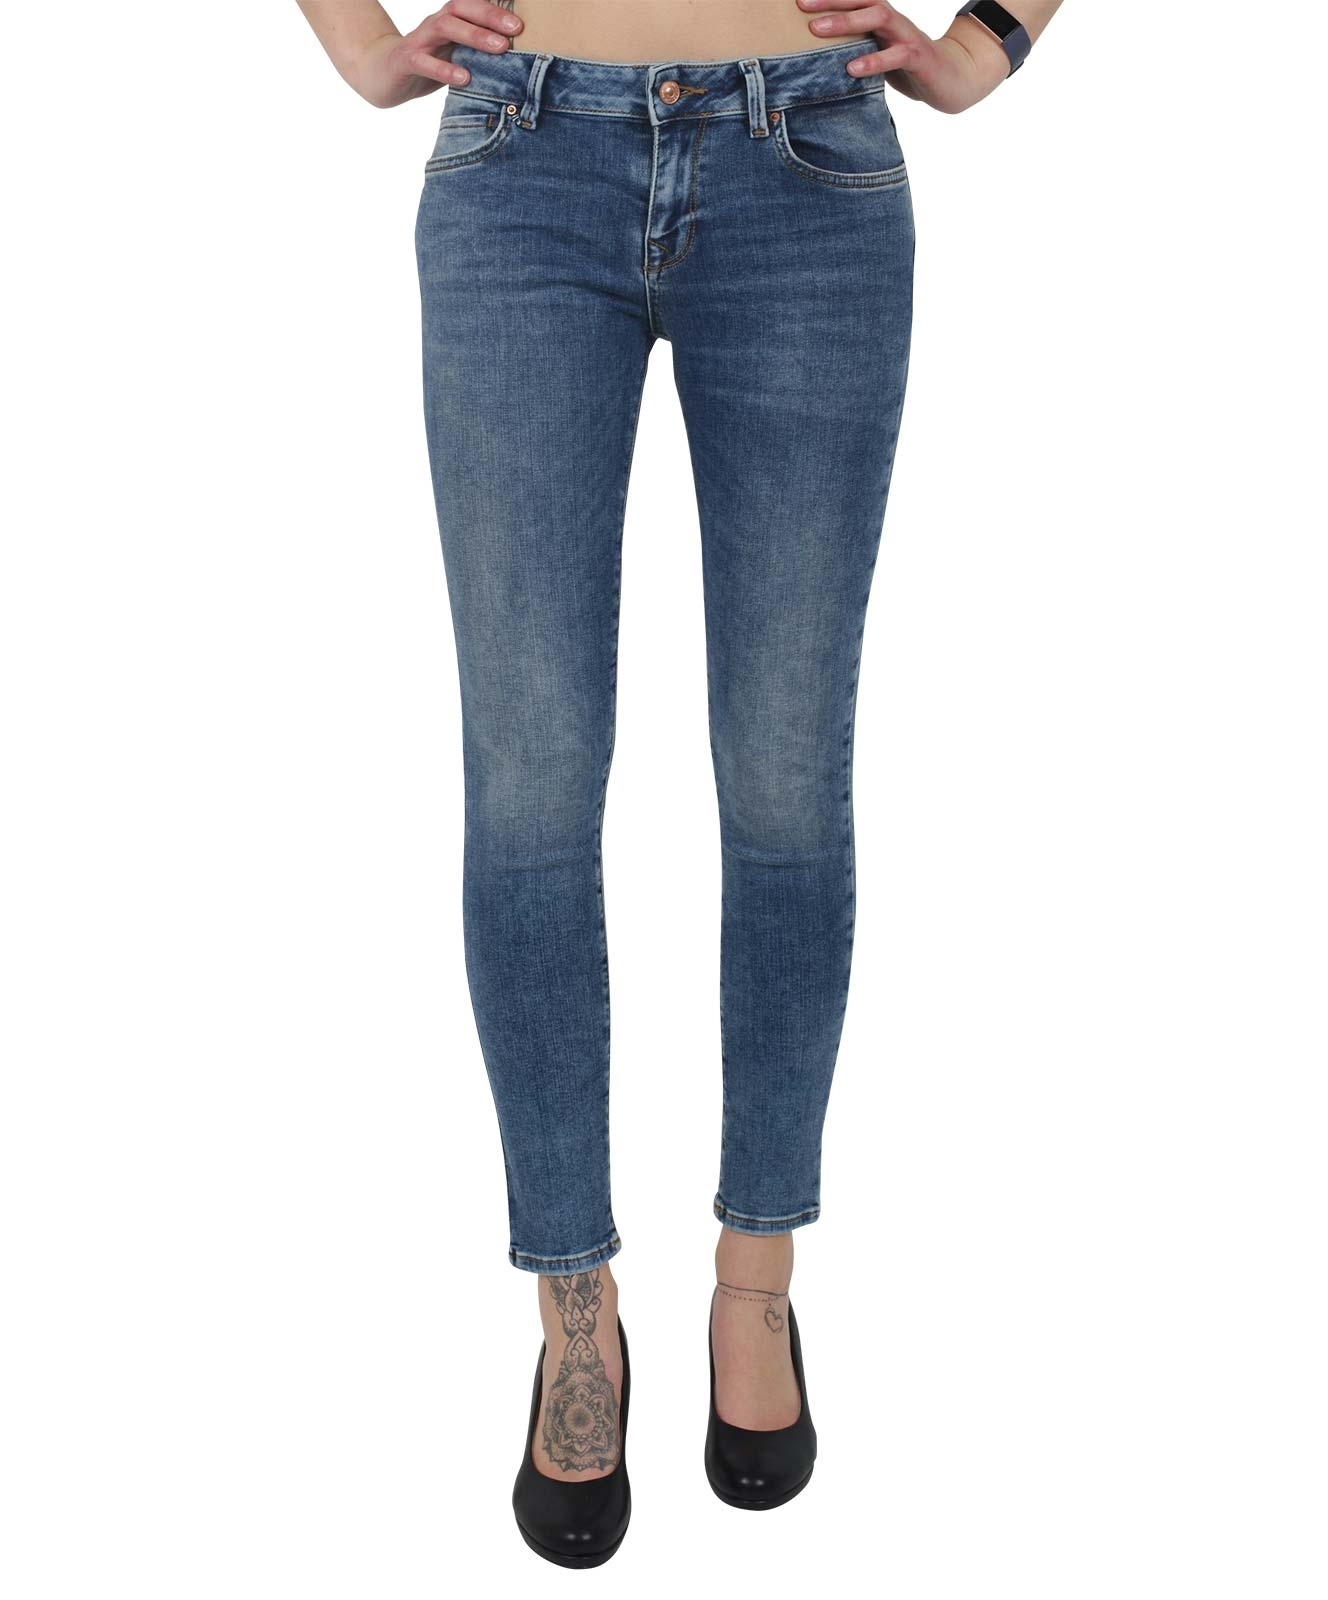 Hosen - LTB Jeans Röhre Nicole in Yule Wash  - Onlineshop Jeans Meile